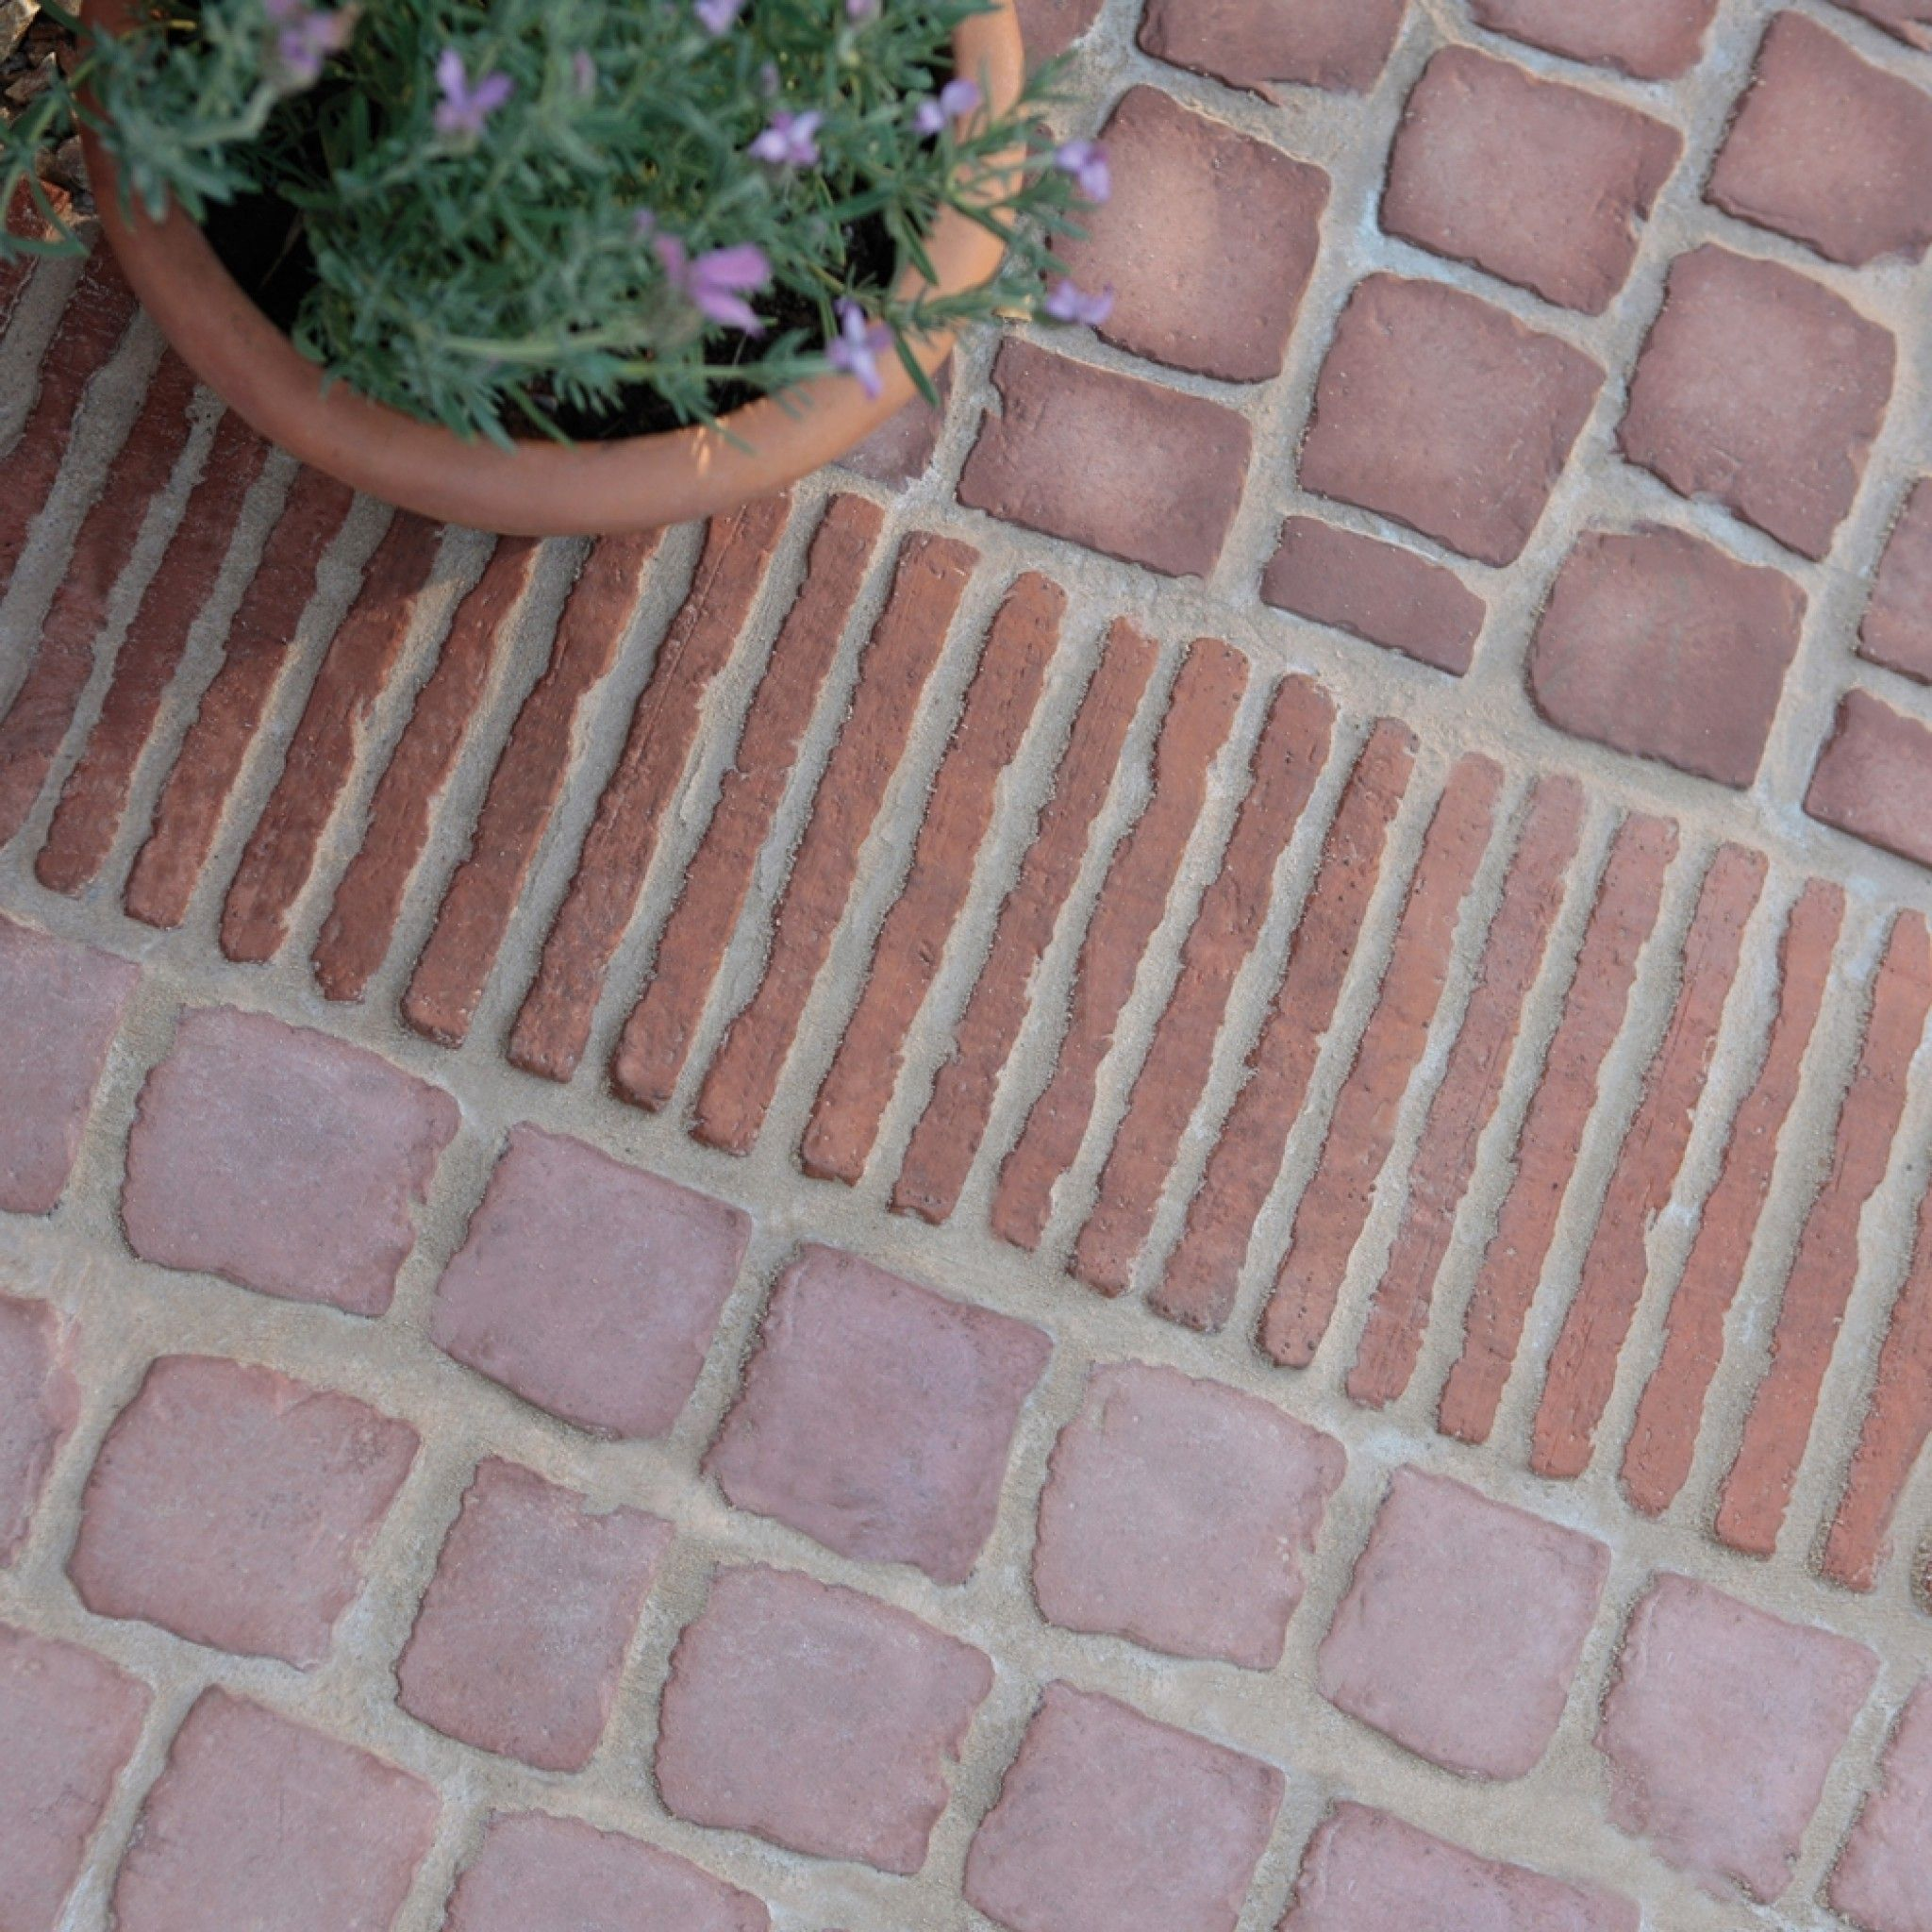 Bradstone Carpet Stones In Rustic Red Stone Edging Garden Edging Stone Driveway